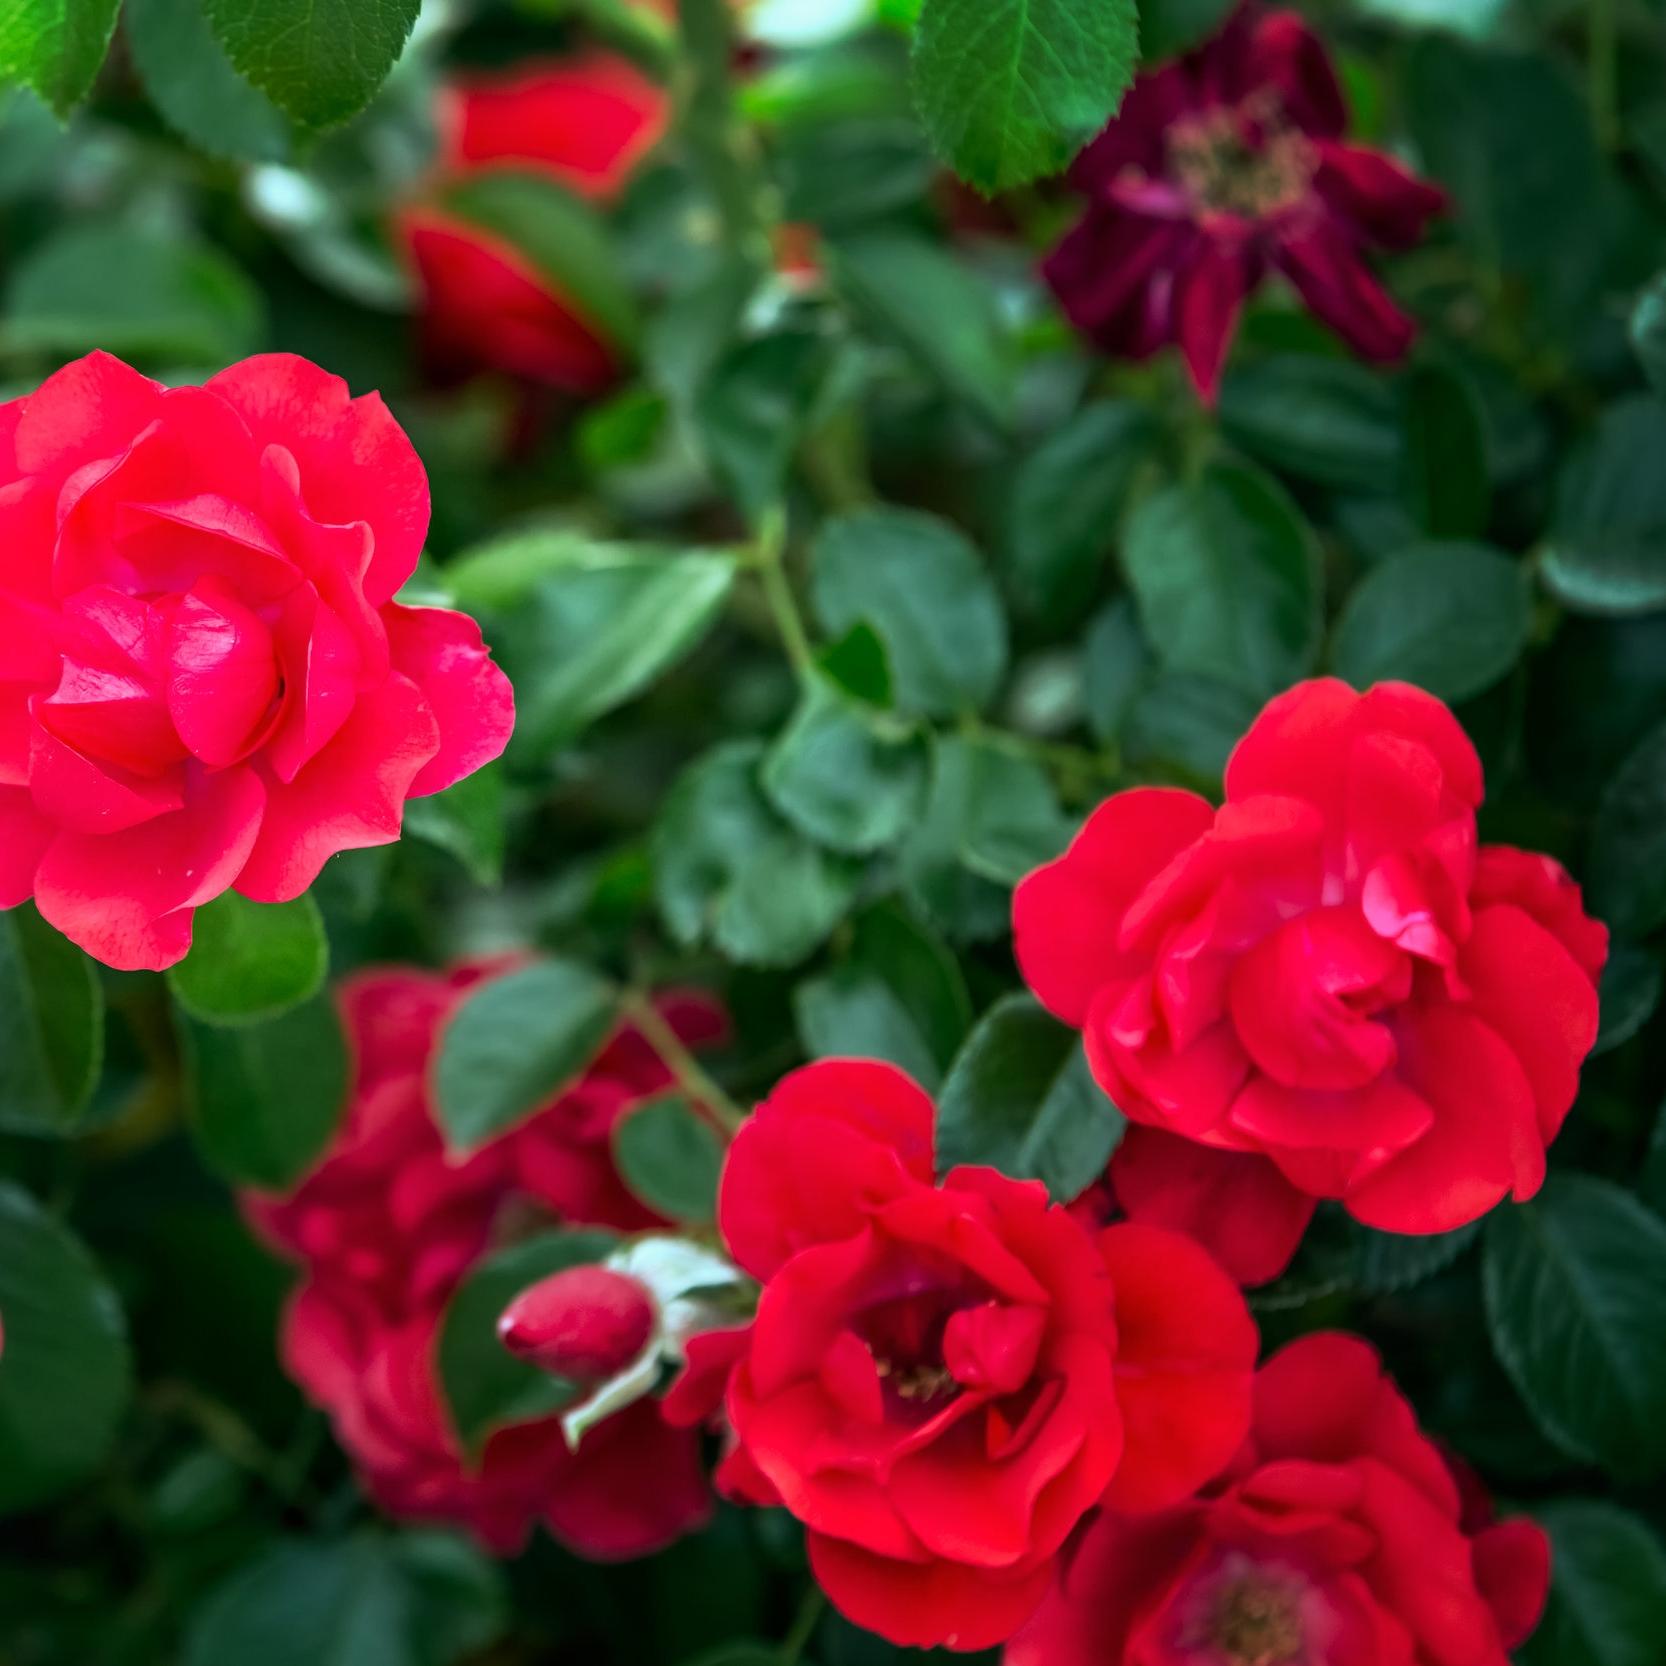 roses-PNDSZG6.jpg